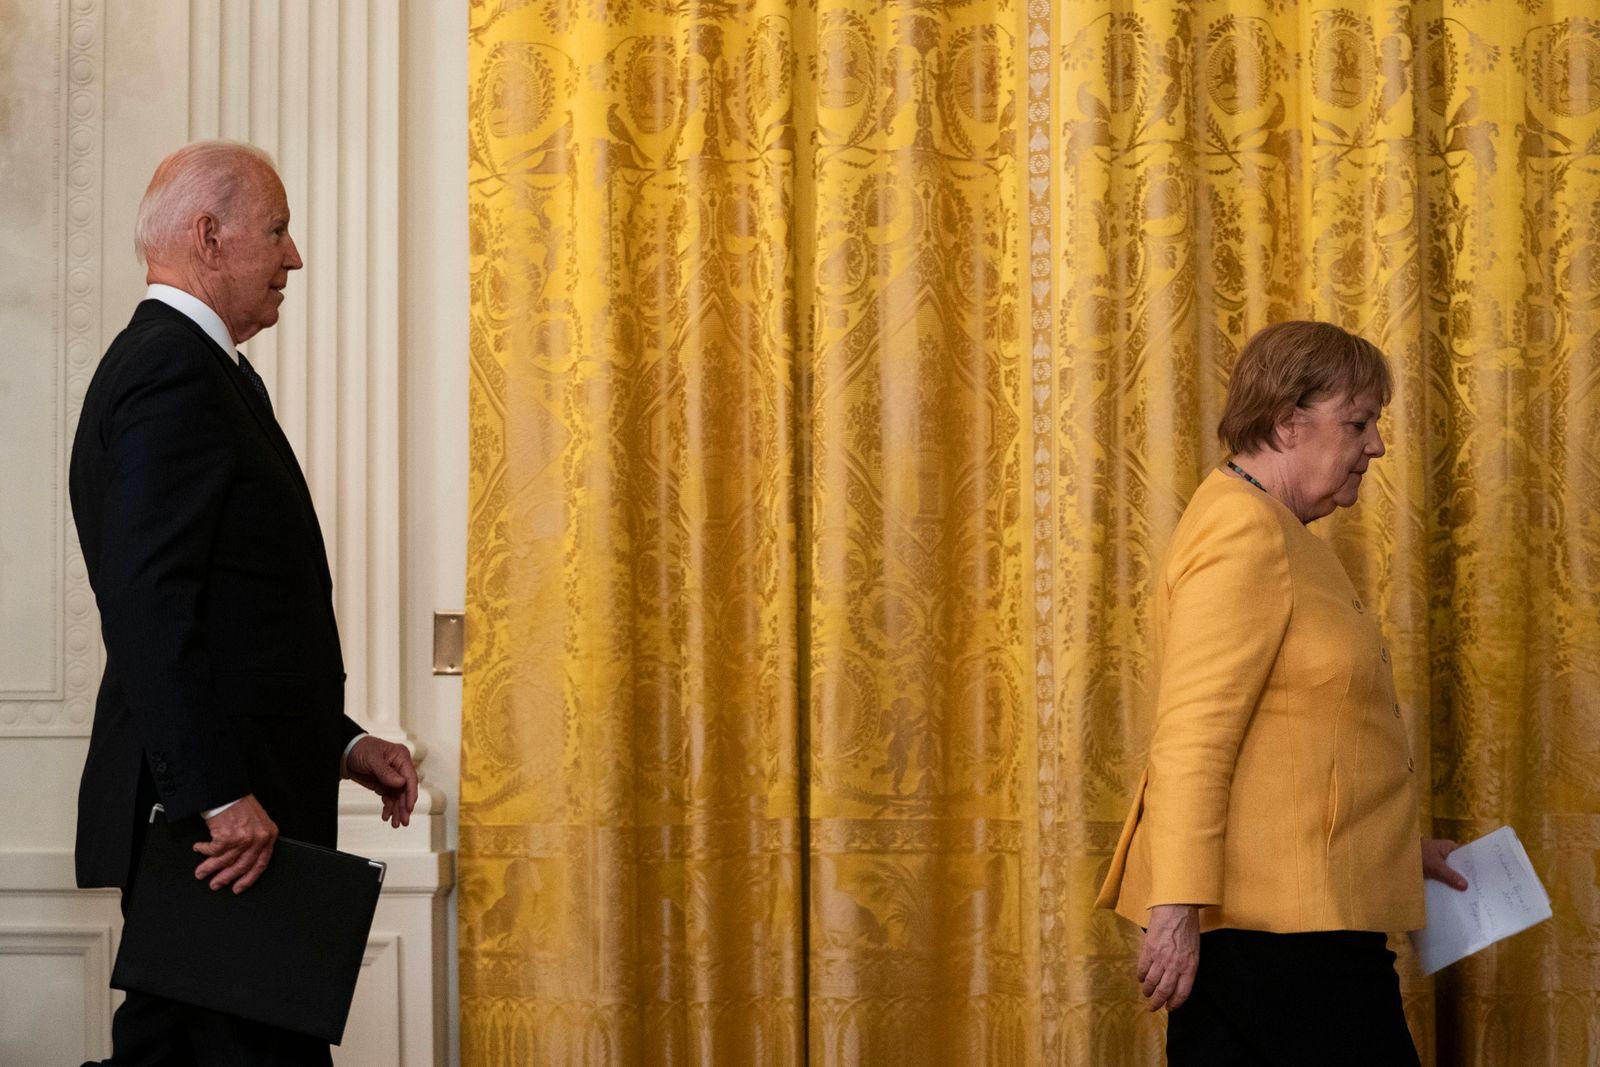 July 15, 2021, Washington, District of Columbia, USA: United States President Joe Biden, left, and Chancellor Dr. Angela